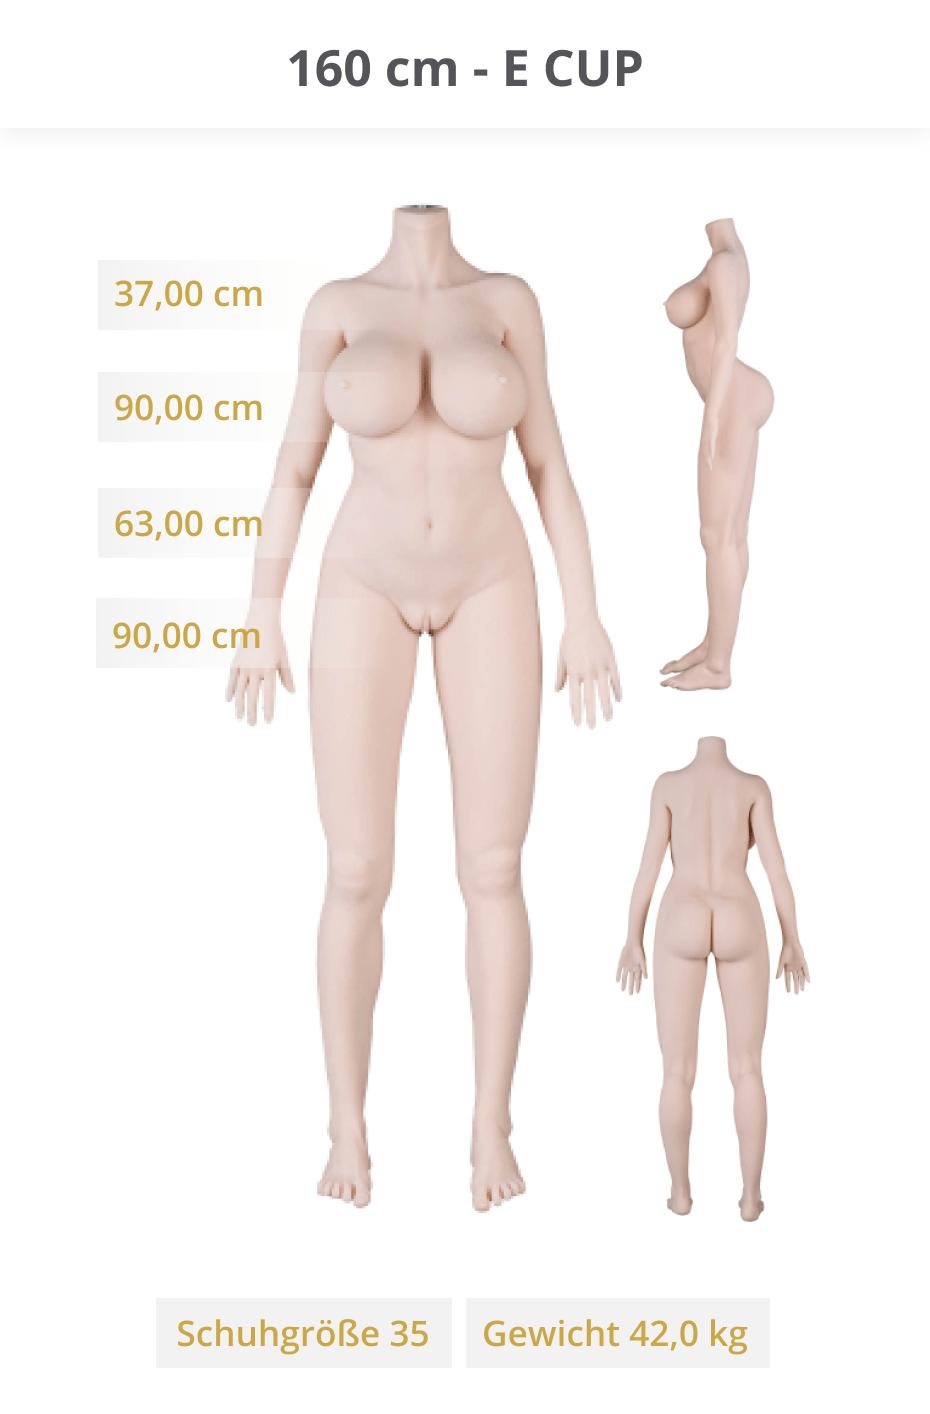 6ye-Dolls-160-cm-E-CUP